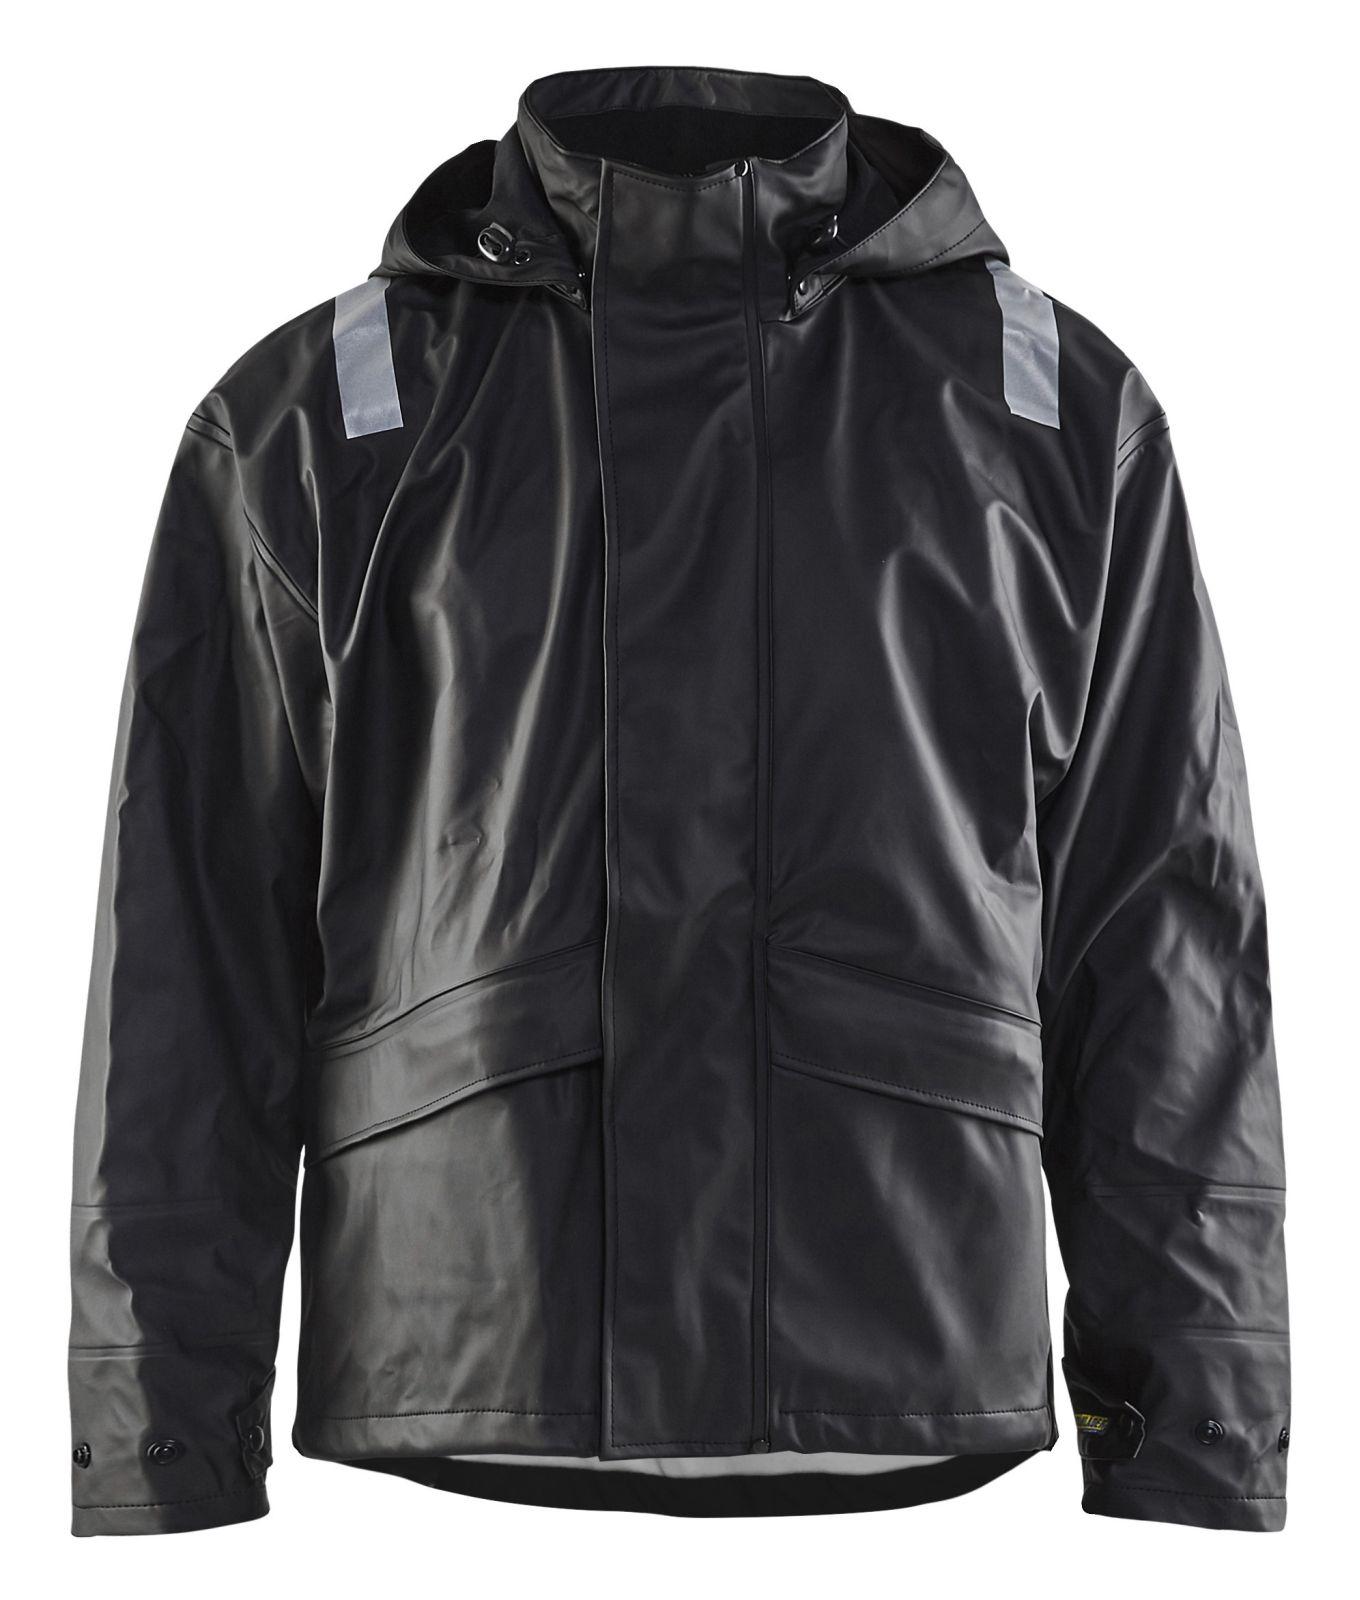 Blaklader Regenjacks 43022003 zwart(9900)